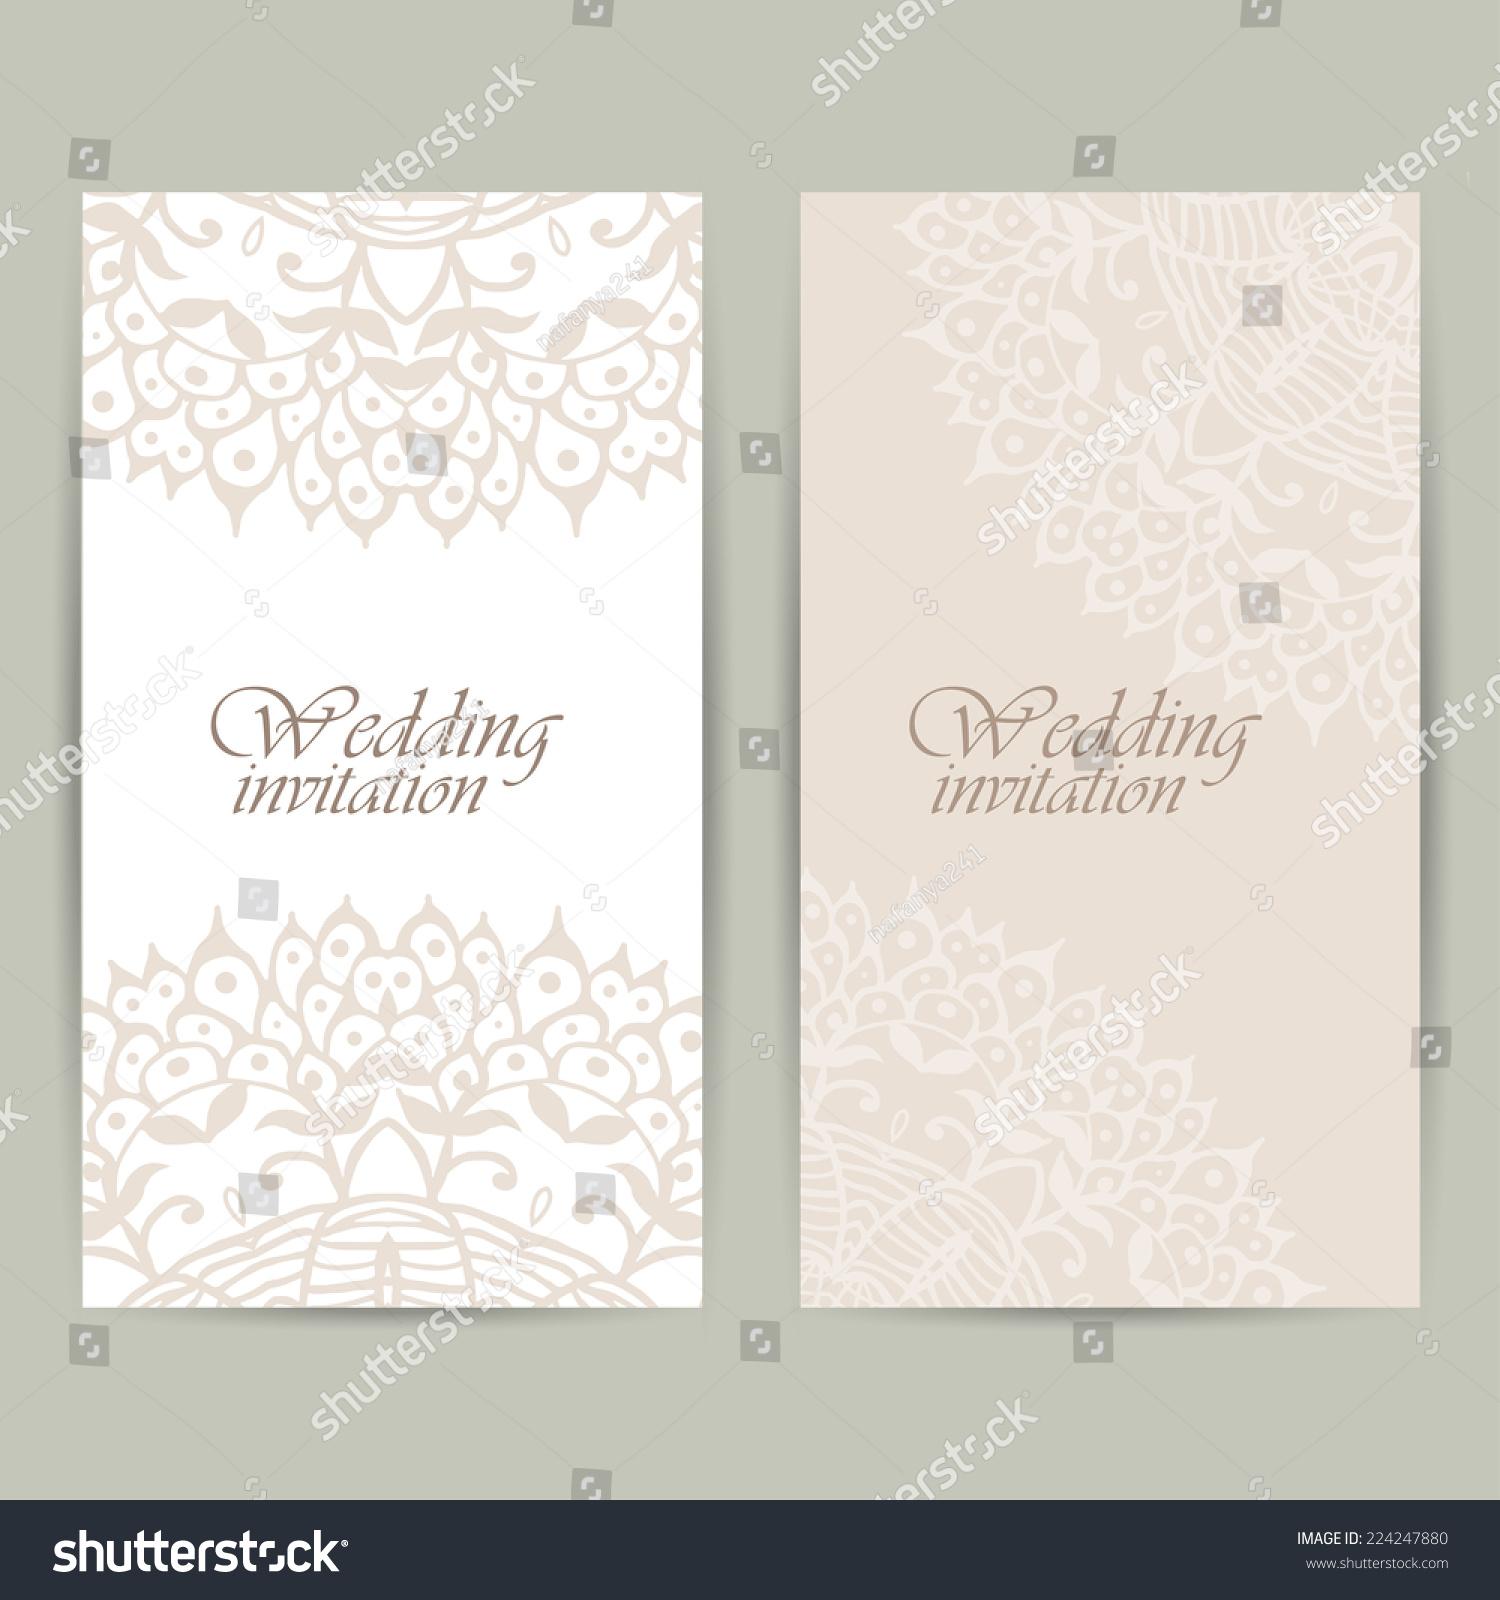 Vertical Wedding Invitation Card Lace Ornament Stock Vector ...